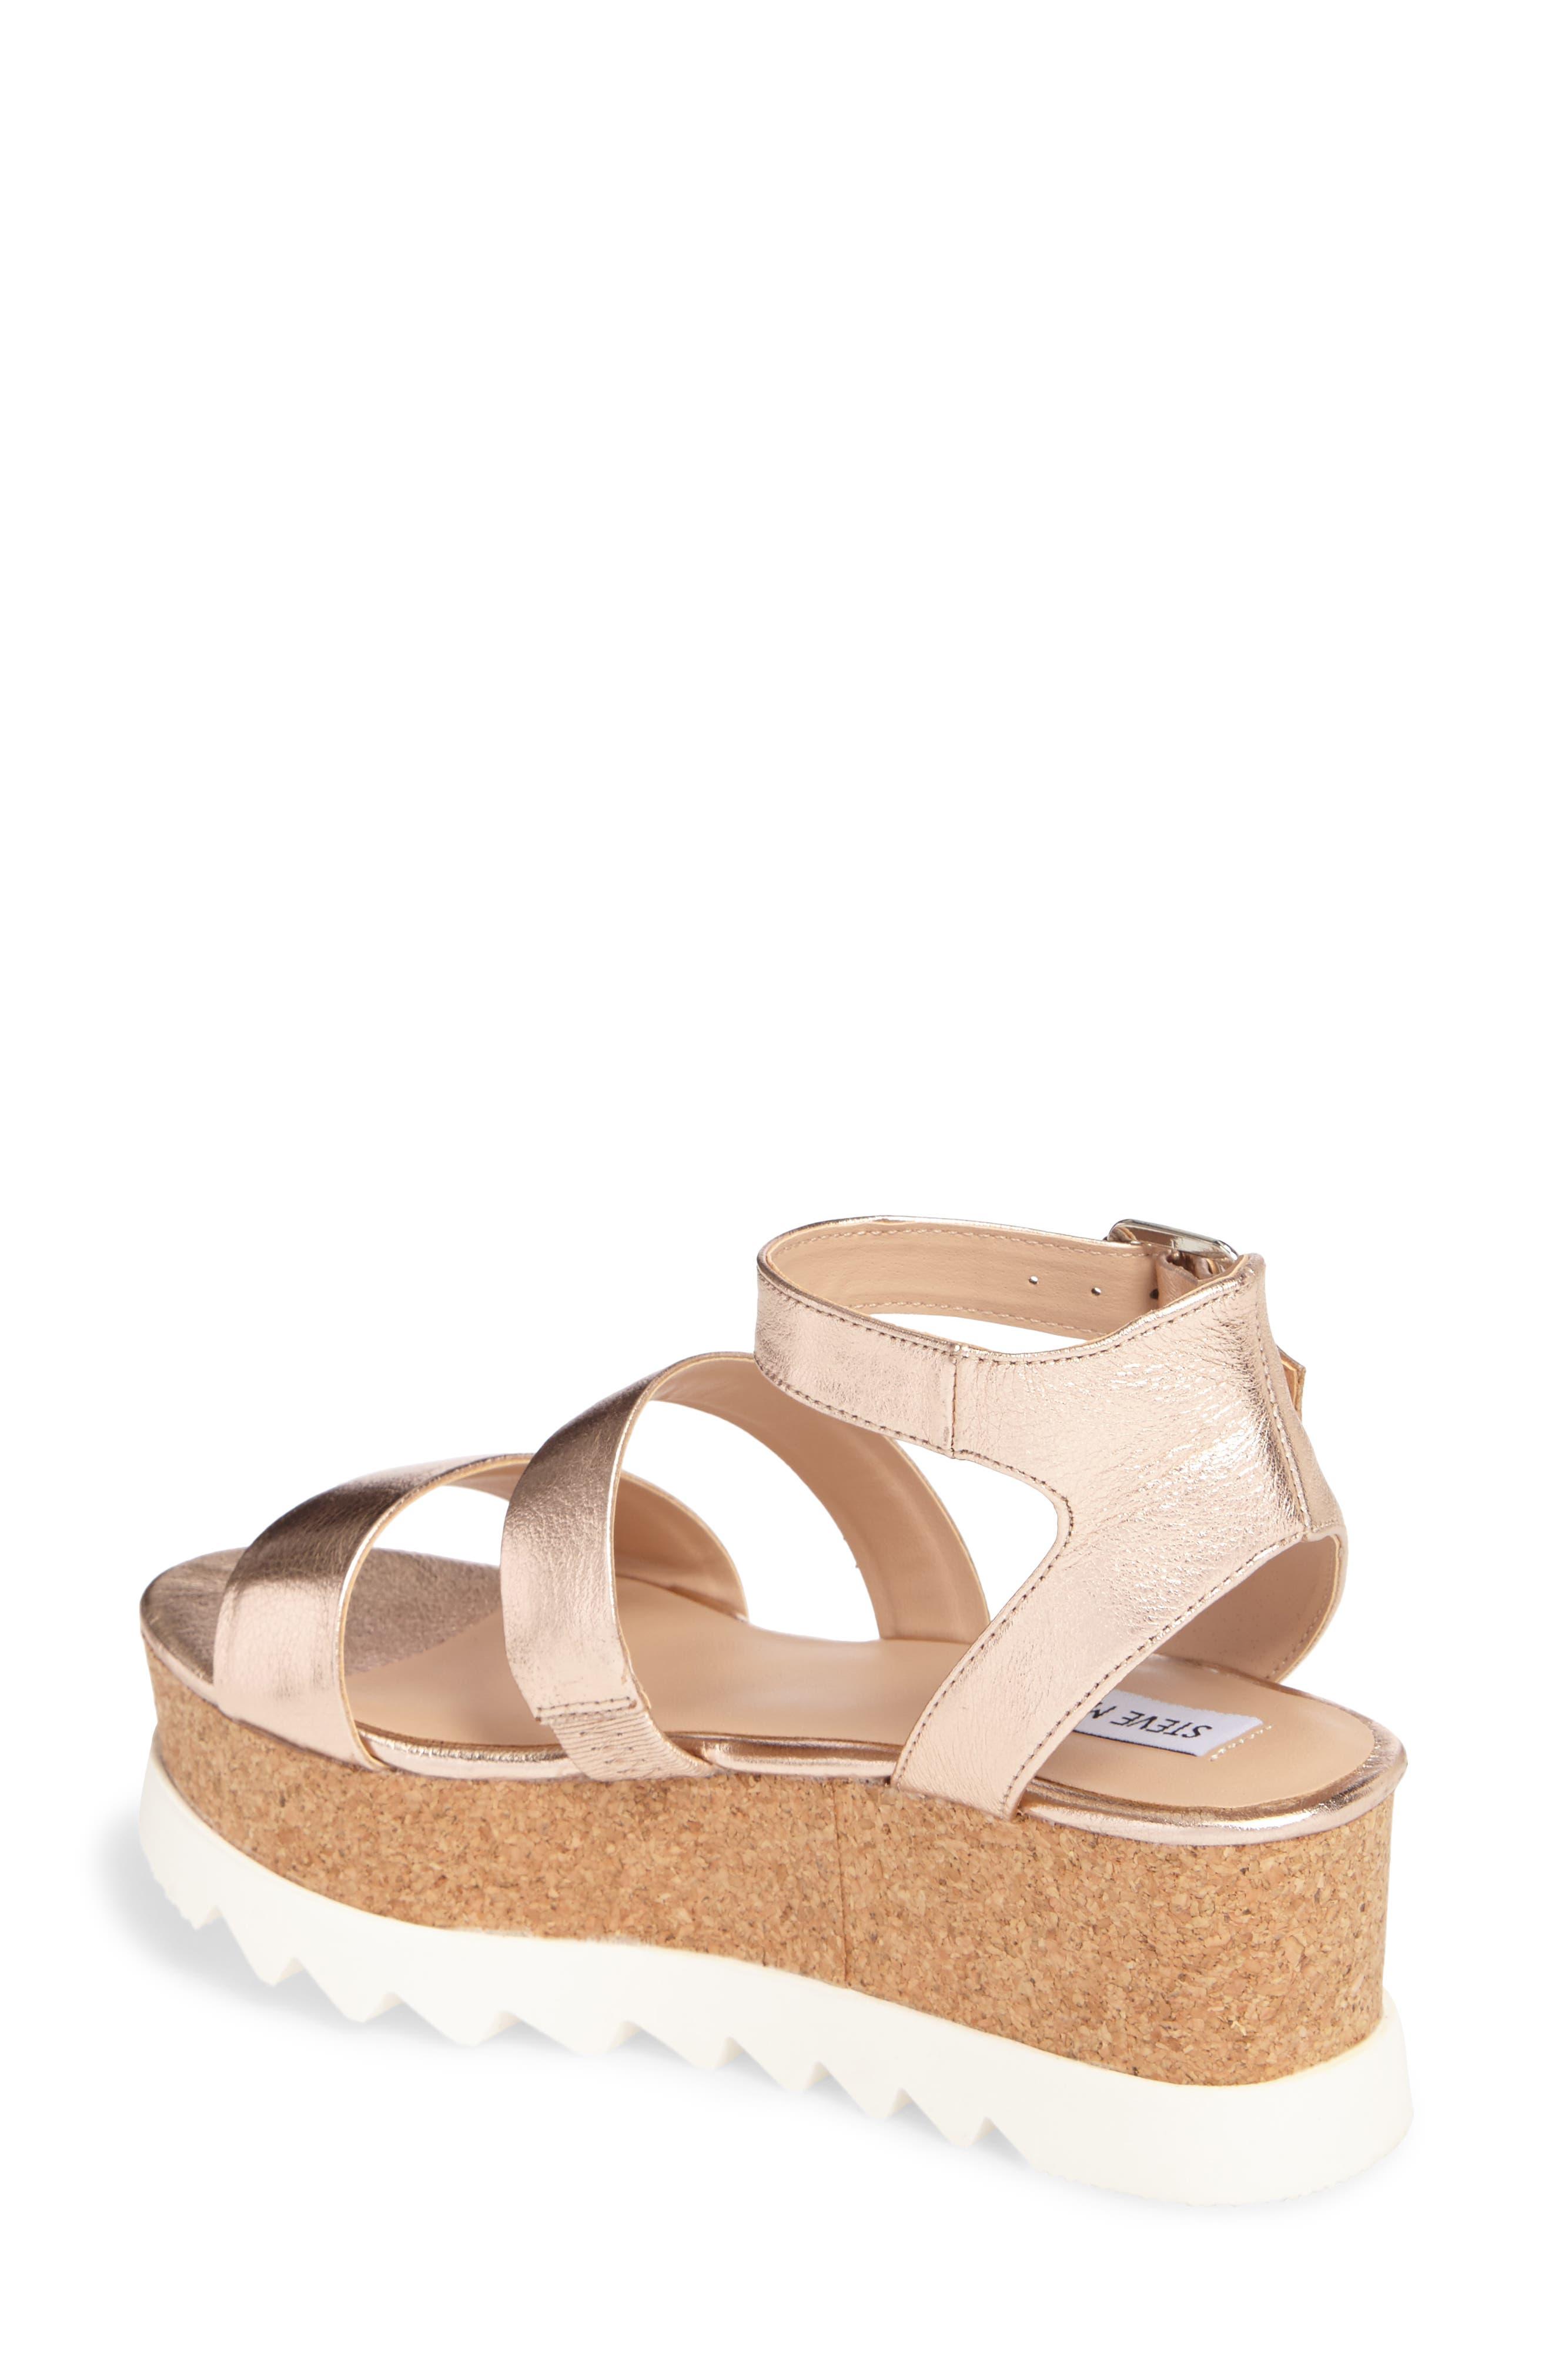 Kirsten Layered Platform Sandal,                             Alternate thumbnail 2, color,                             Rose Leather